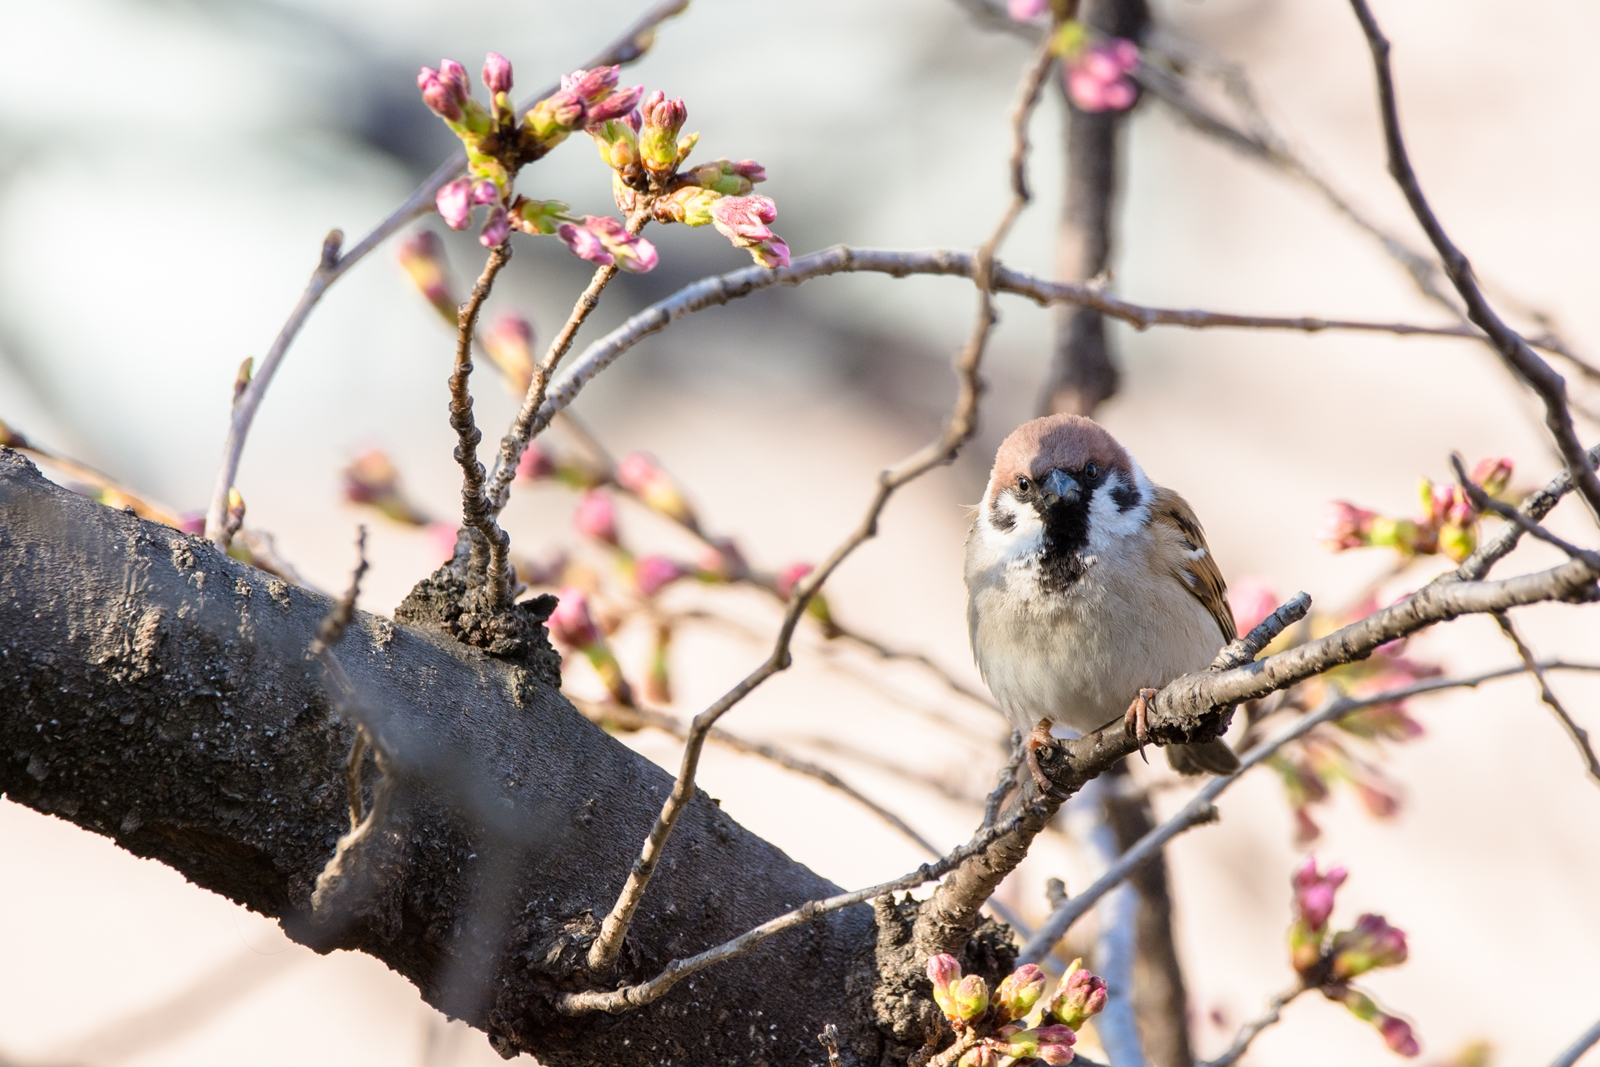 Photo: 「待ってるよ」 / Looking forward to It.  待ってるよ じぃ~っとじぃ~っと とっても楽しみなこと もう少しかな  sparrow. (スズメ)  Nikon D7200 SIGMA 150-600mm F5-6.3 DG OS HSM Contemporary  #birdphotography #birds #kawaii #小鳥 #nikon #sigma #小鳥グラファー  ( http://takafumiooshio.com/archives/1410 )